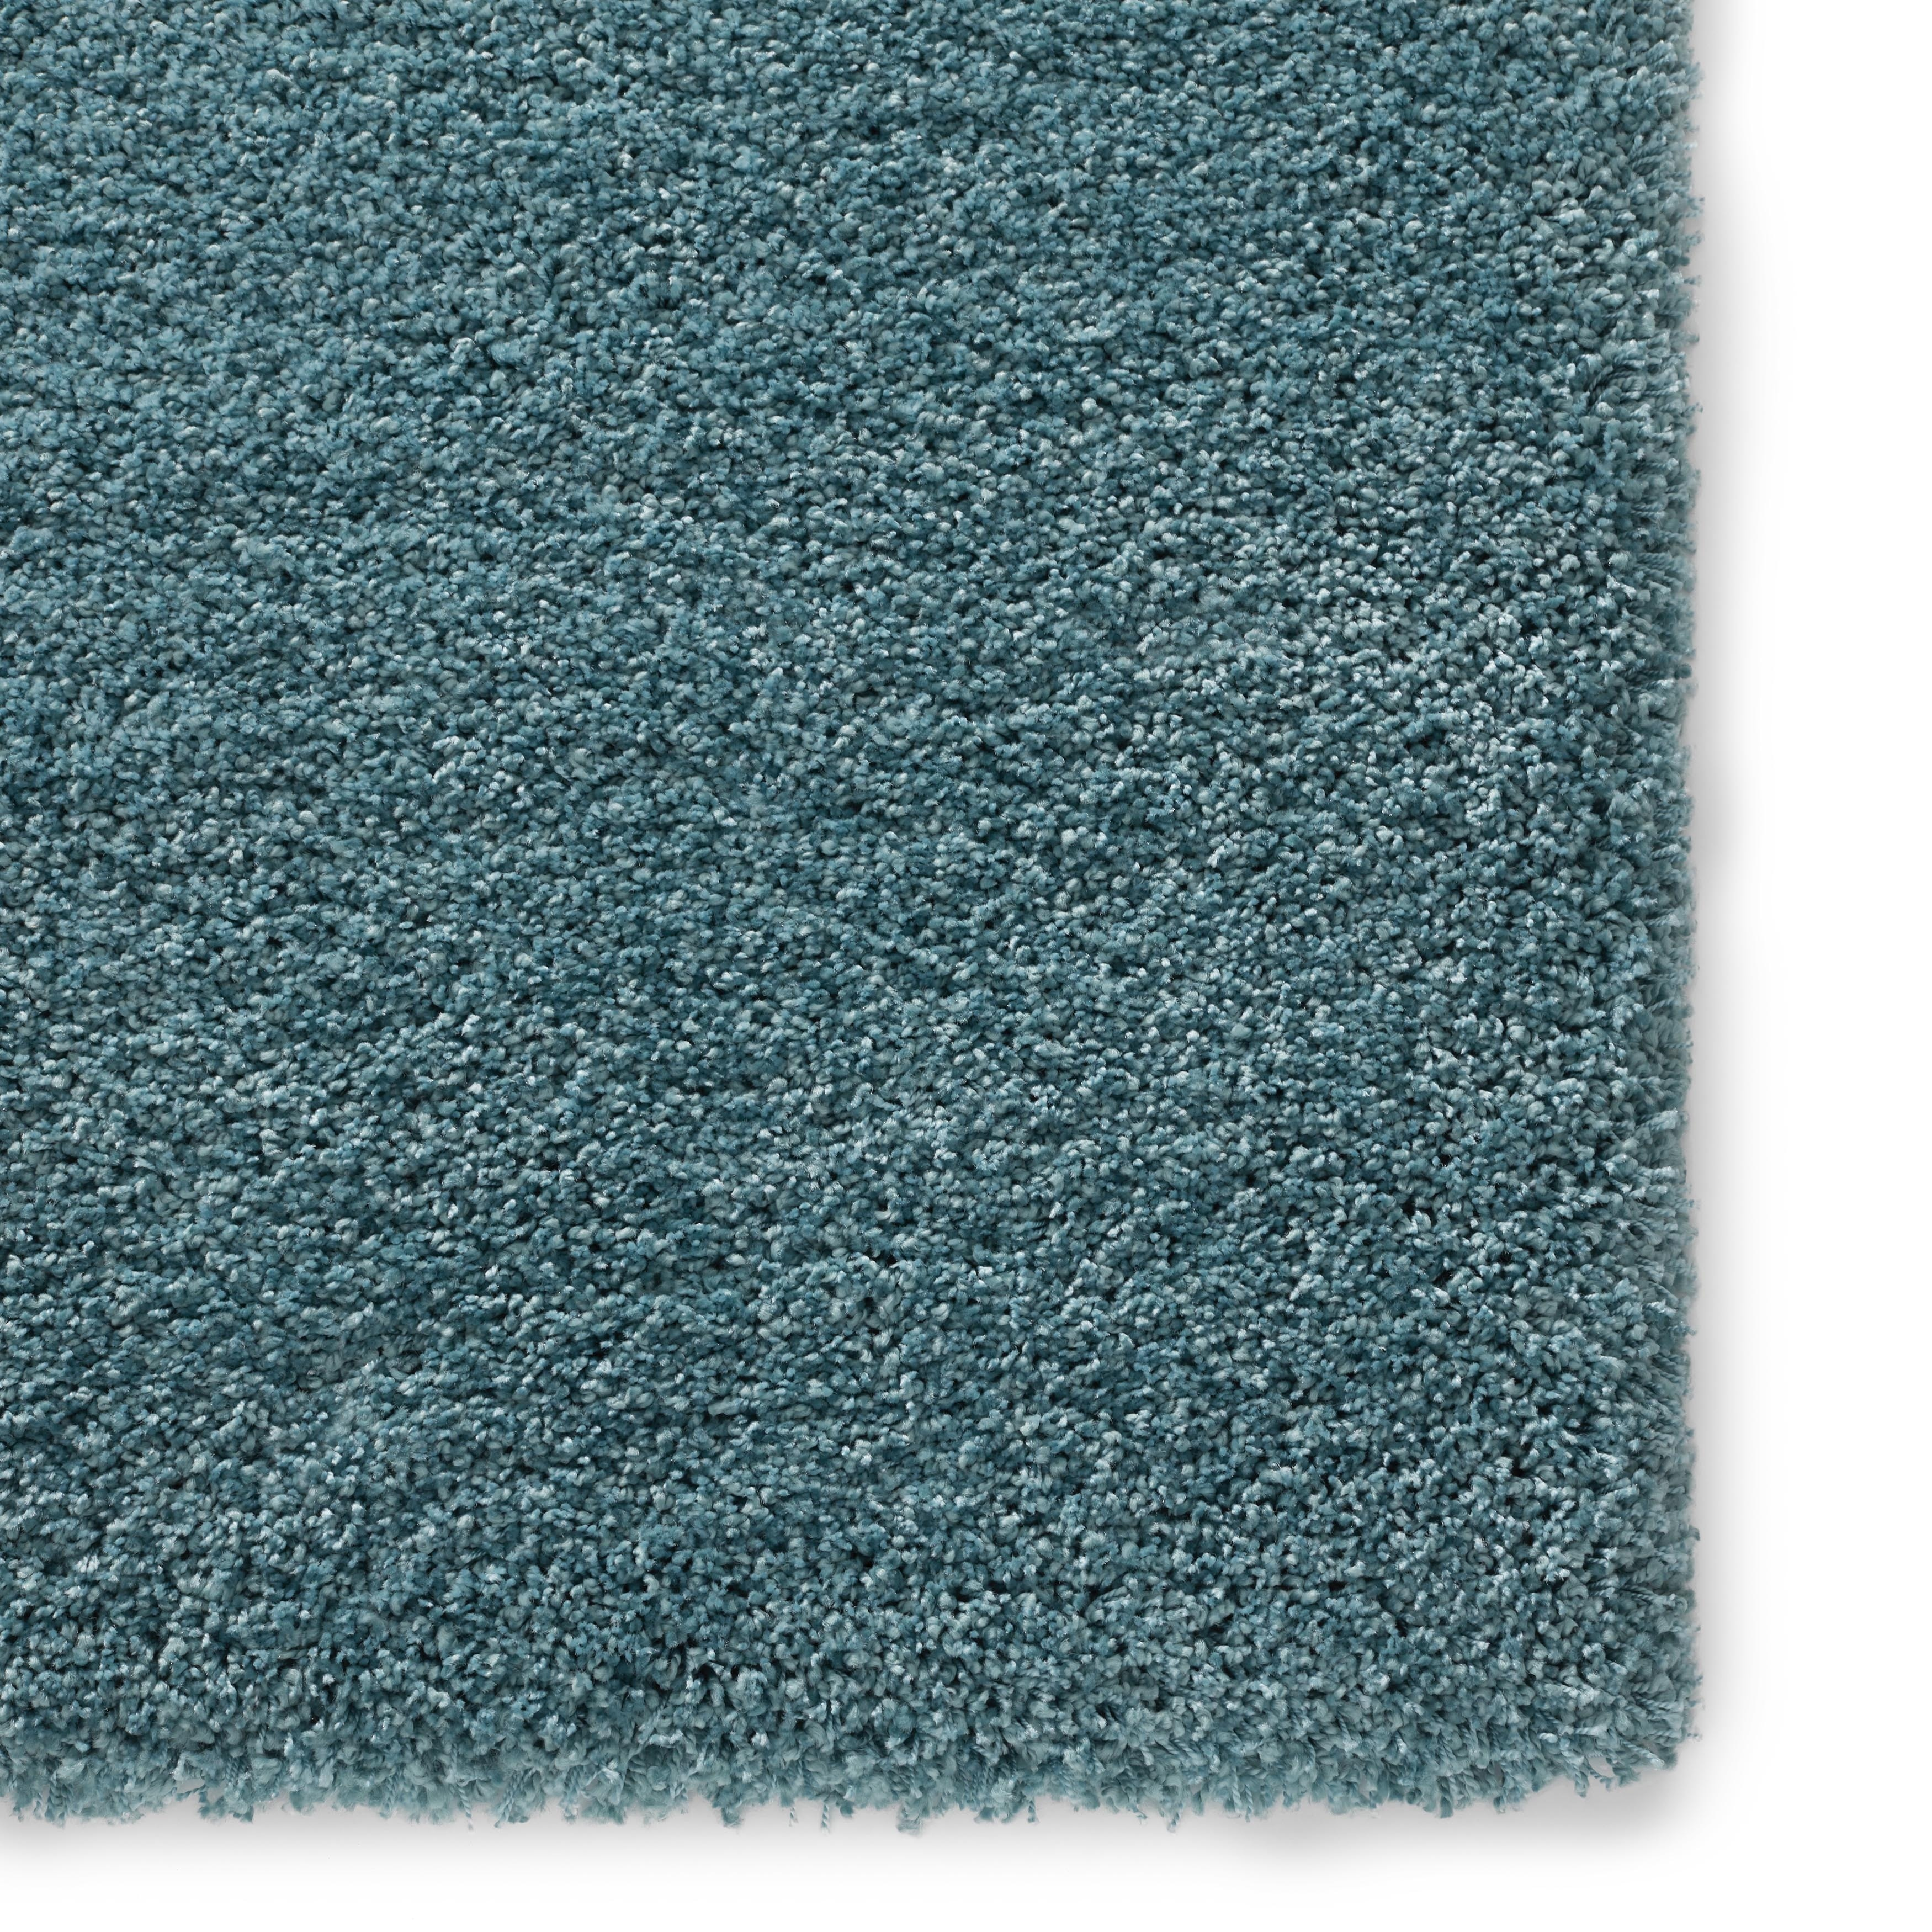 Safavieh Milan Aqua Blue Rug 8 6 X 12 On Free Shipping Today 8402839